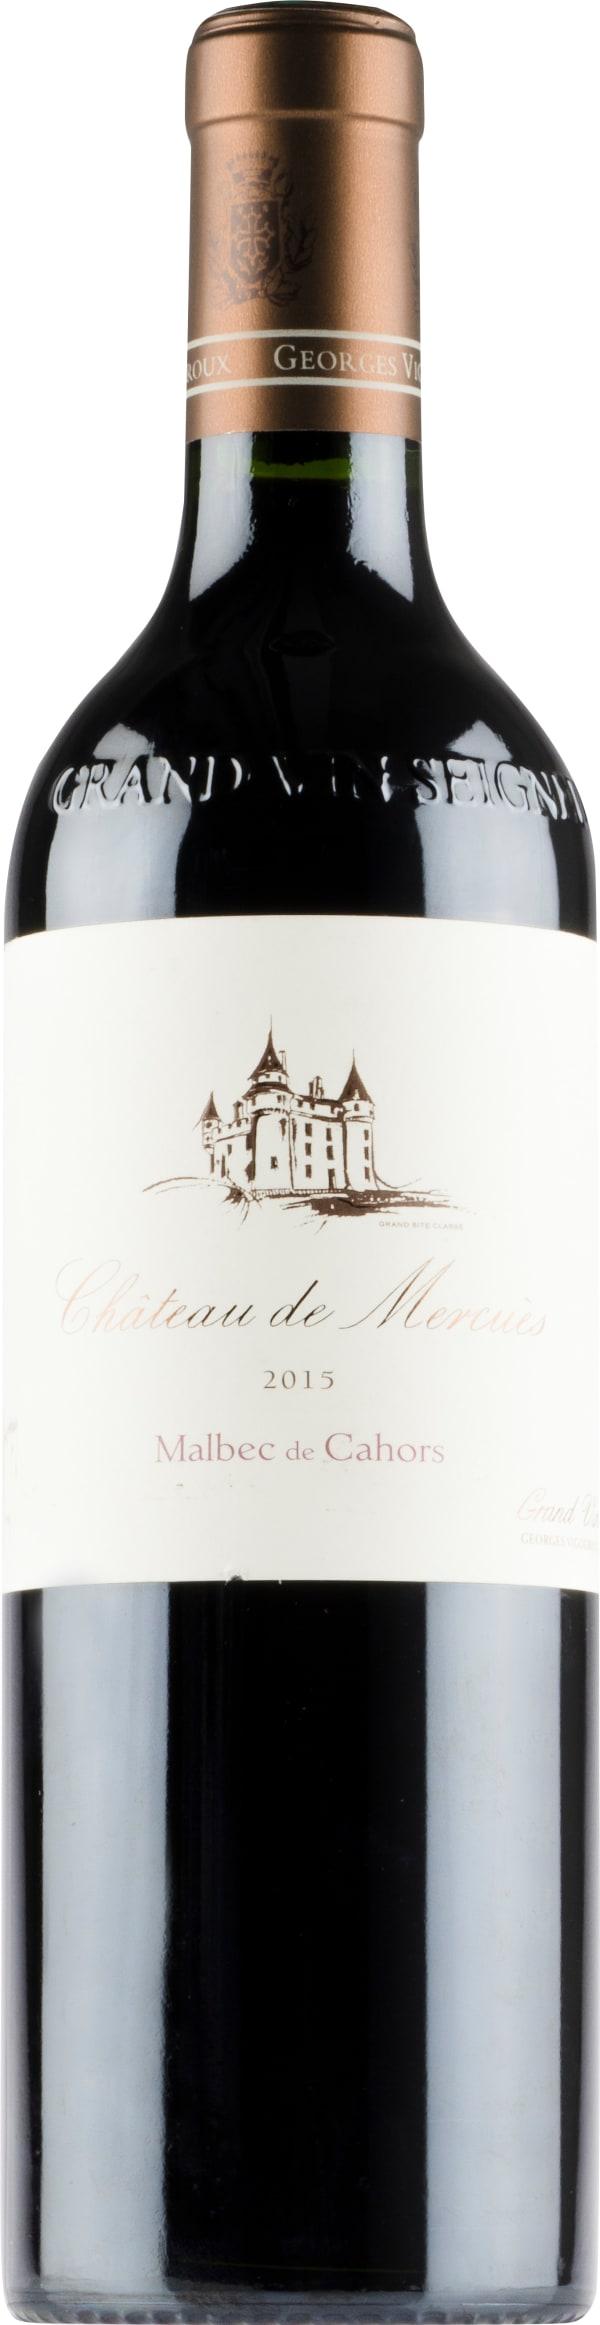 Château de Mercuès Grand Vin 2015